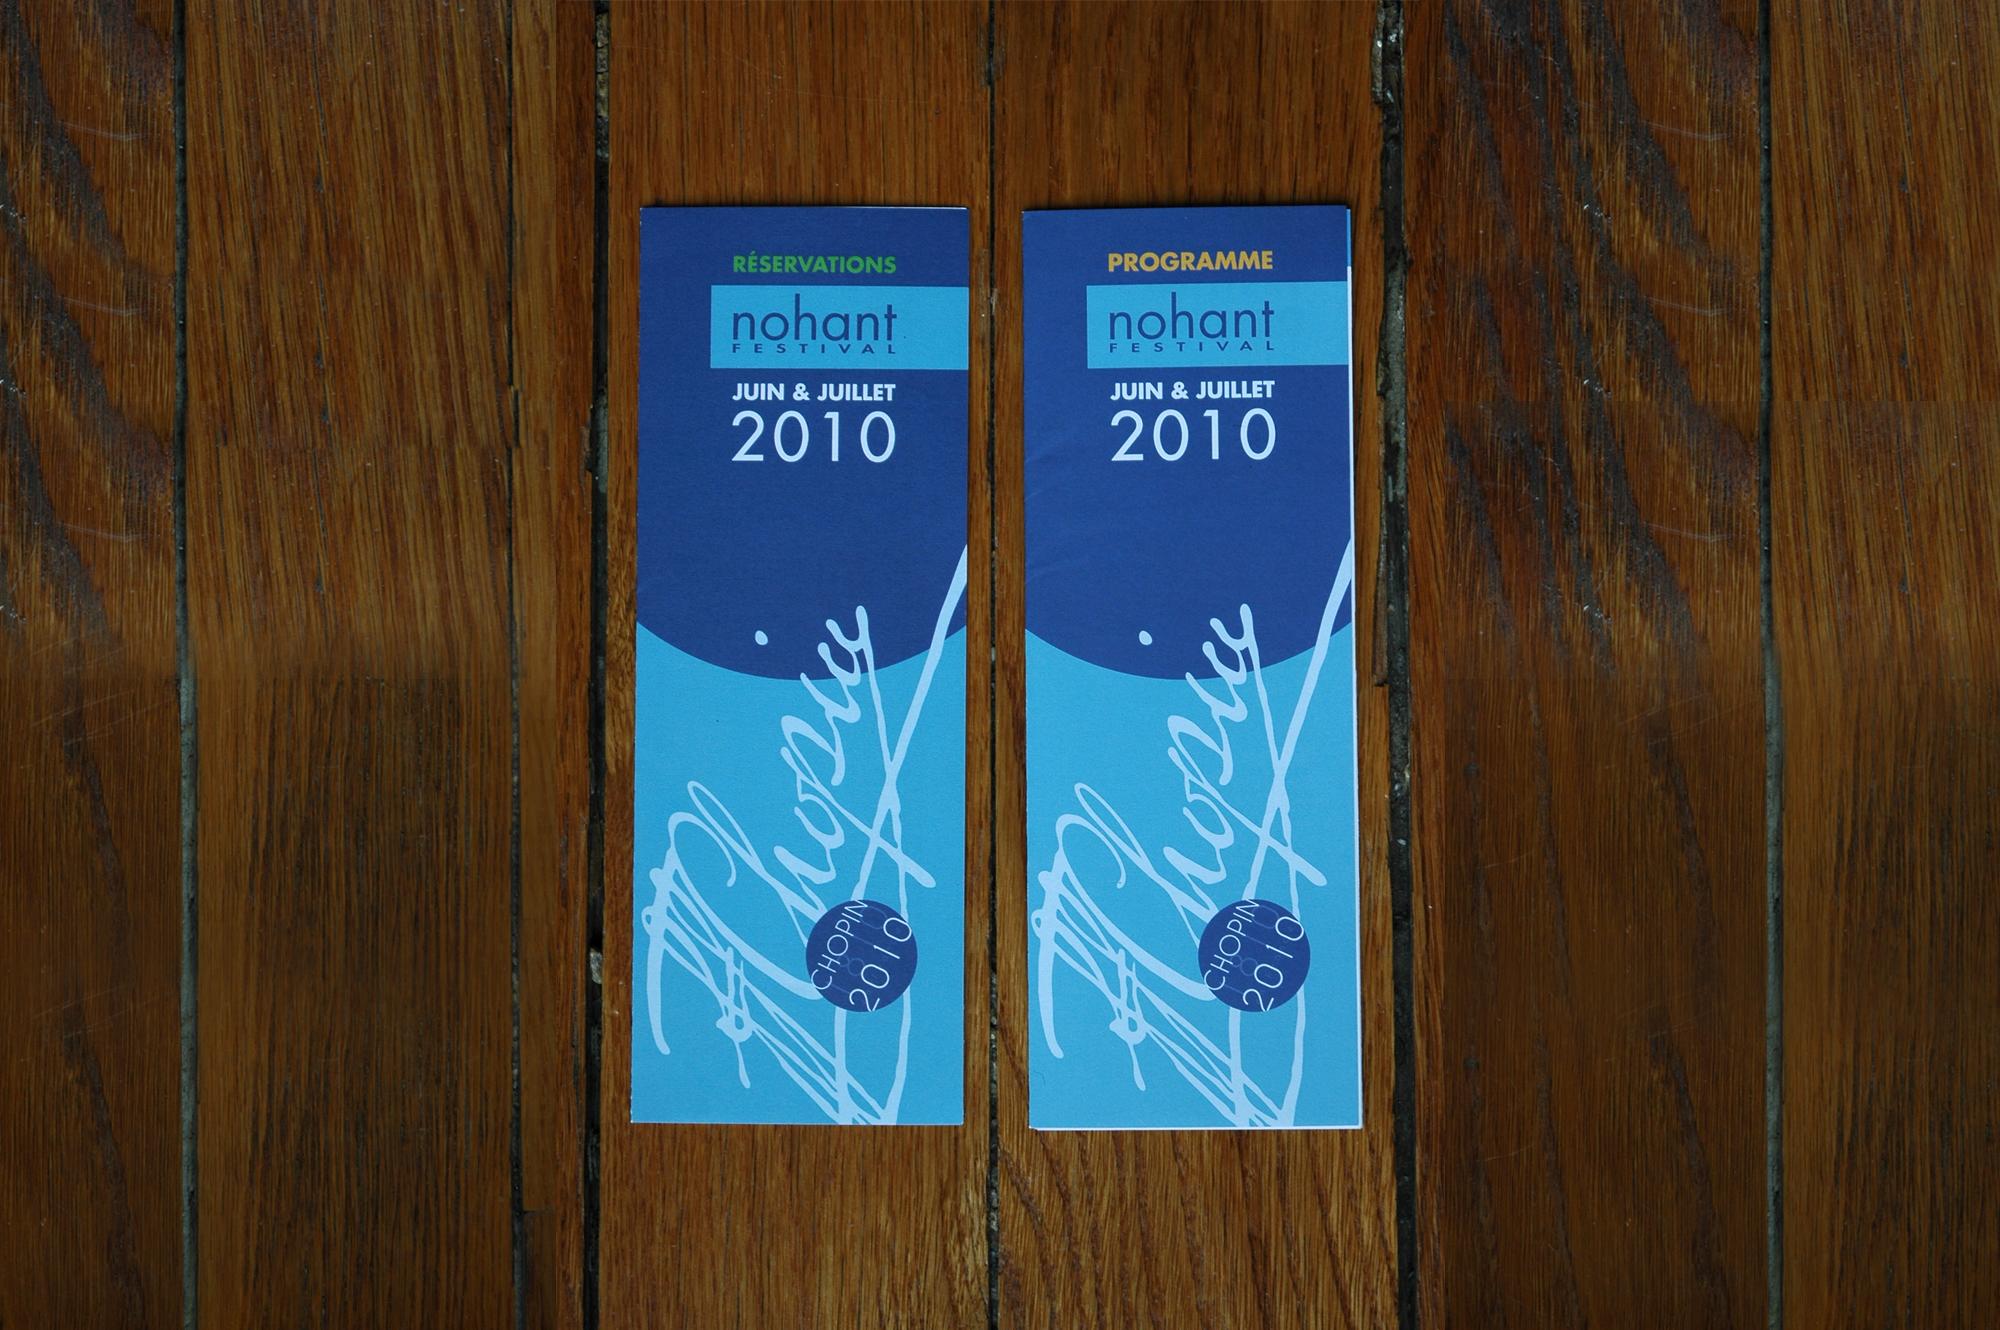 edition-leaflet-festivaldenohant1